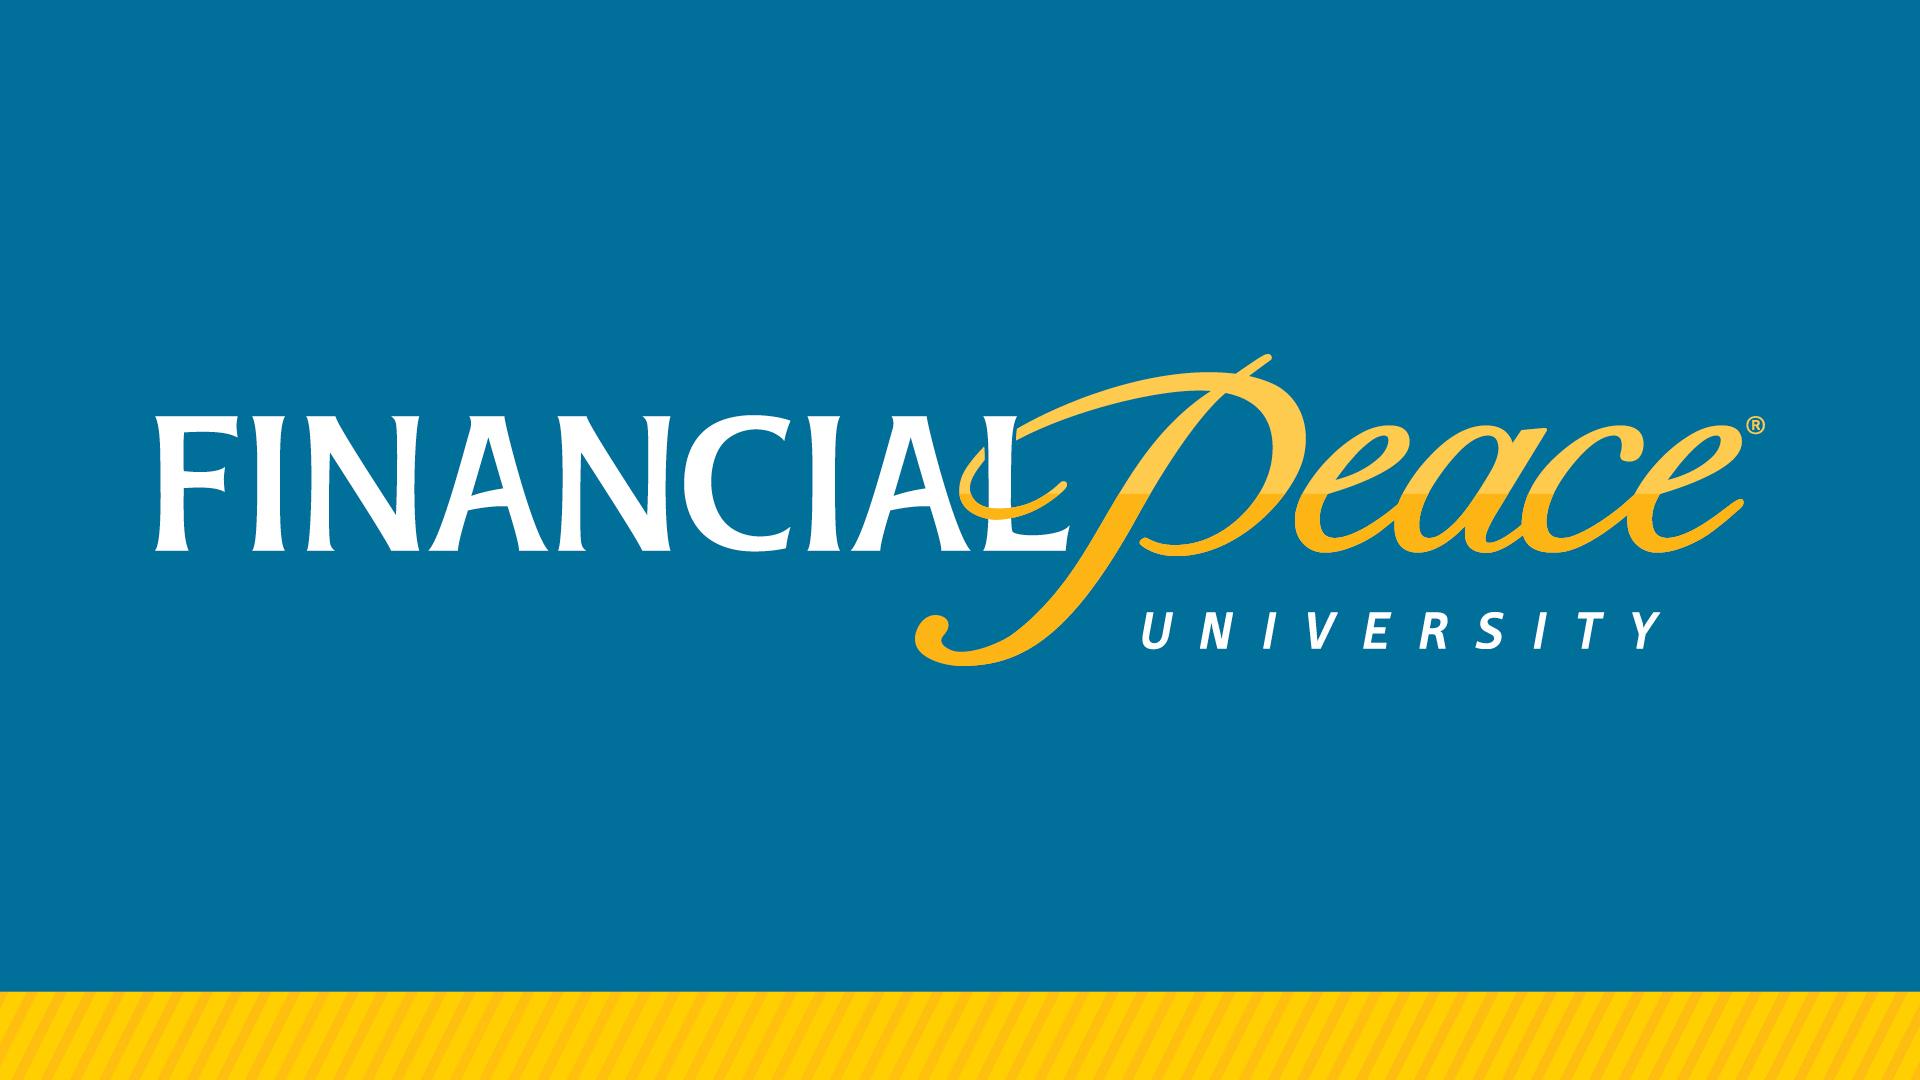 Financial Peace University (Spring 2018) logo